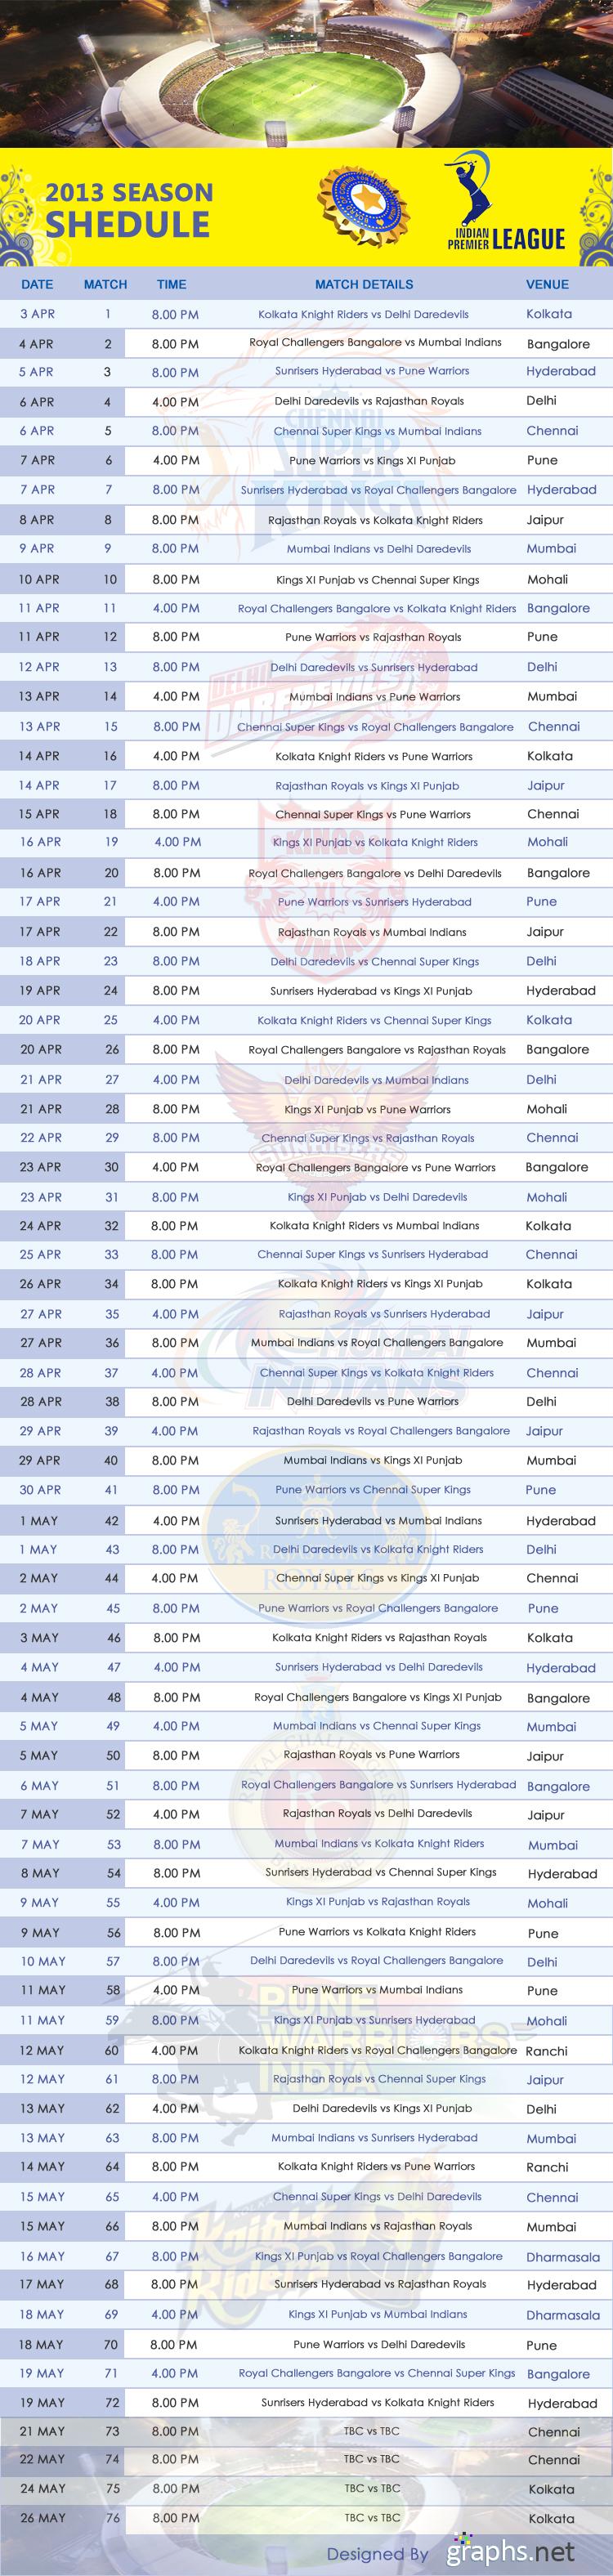 2013 Season IPL Schedule